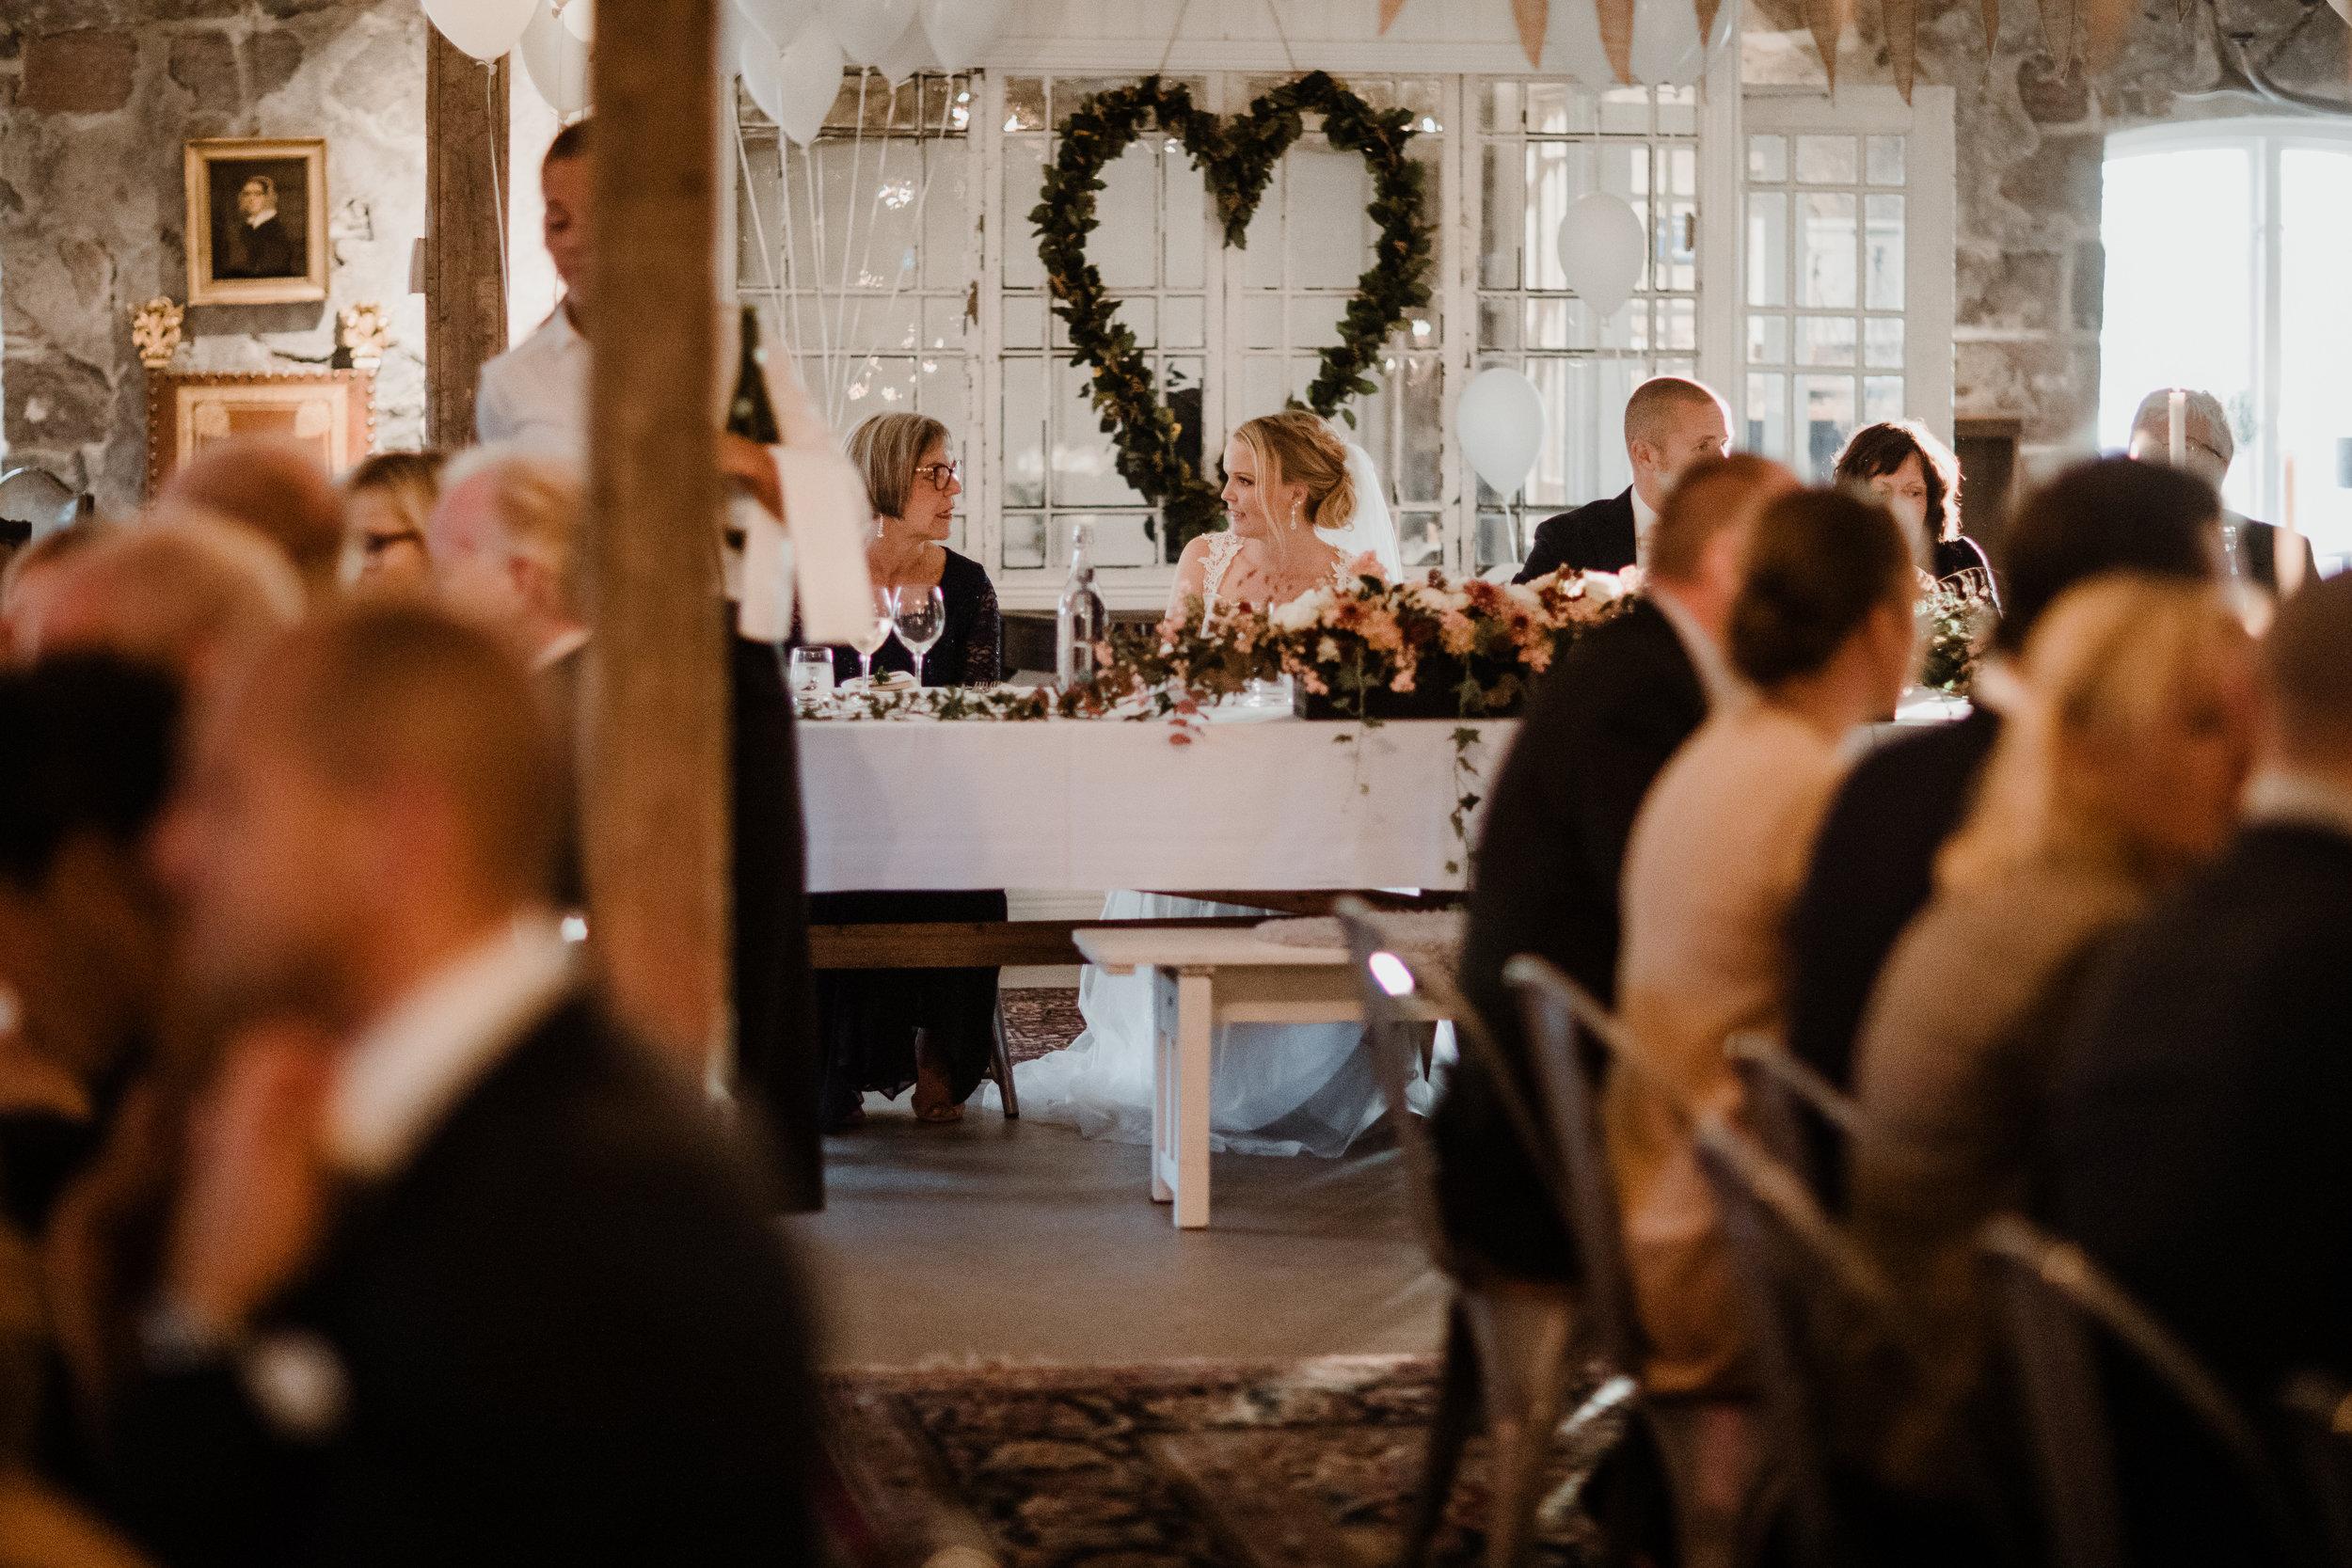 Bröllopsfotograf-Uddetorp Säteri-Höstbröllop-Fotograf Emilia- Bröllopsfotograf Borås-54.jpg